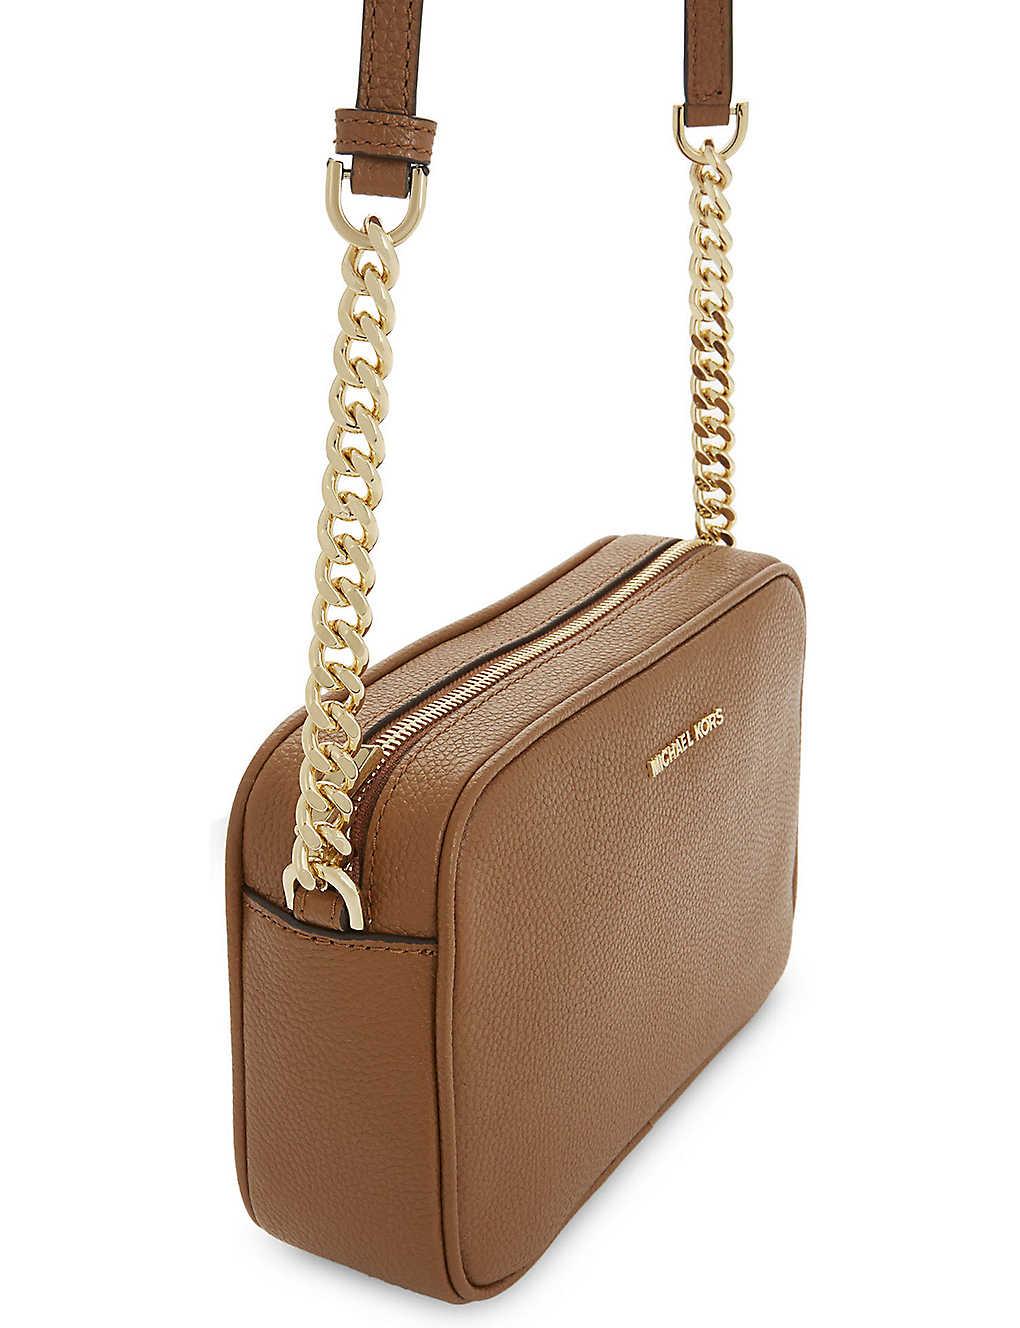 30f4d5419205 MICHAEL MICHAEL KORS - Ginny leather cross-body bag   Selfridges.com